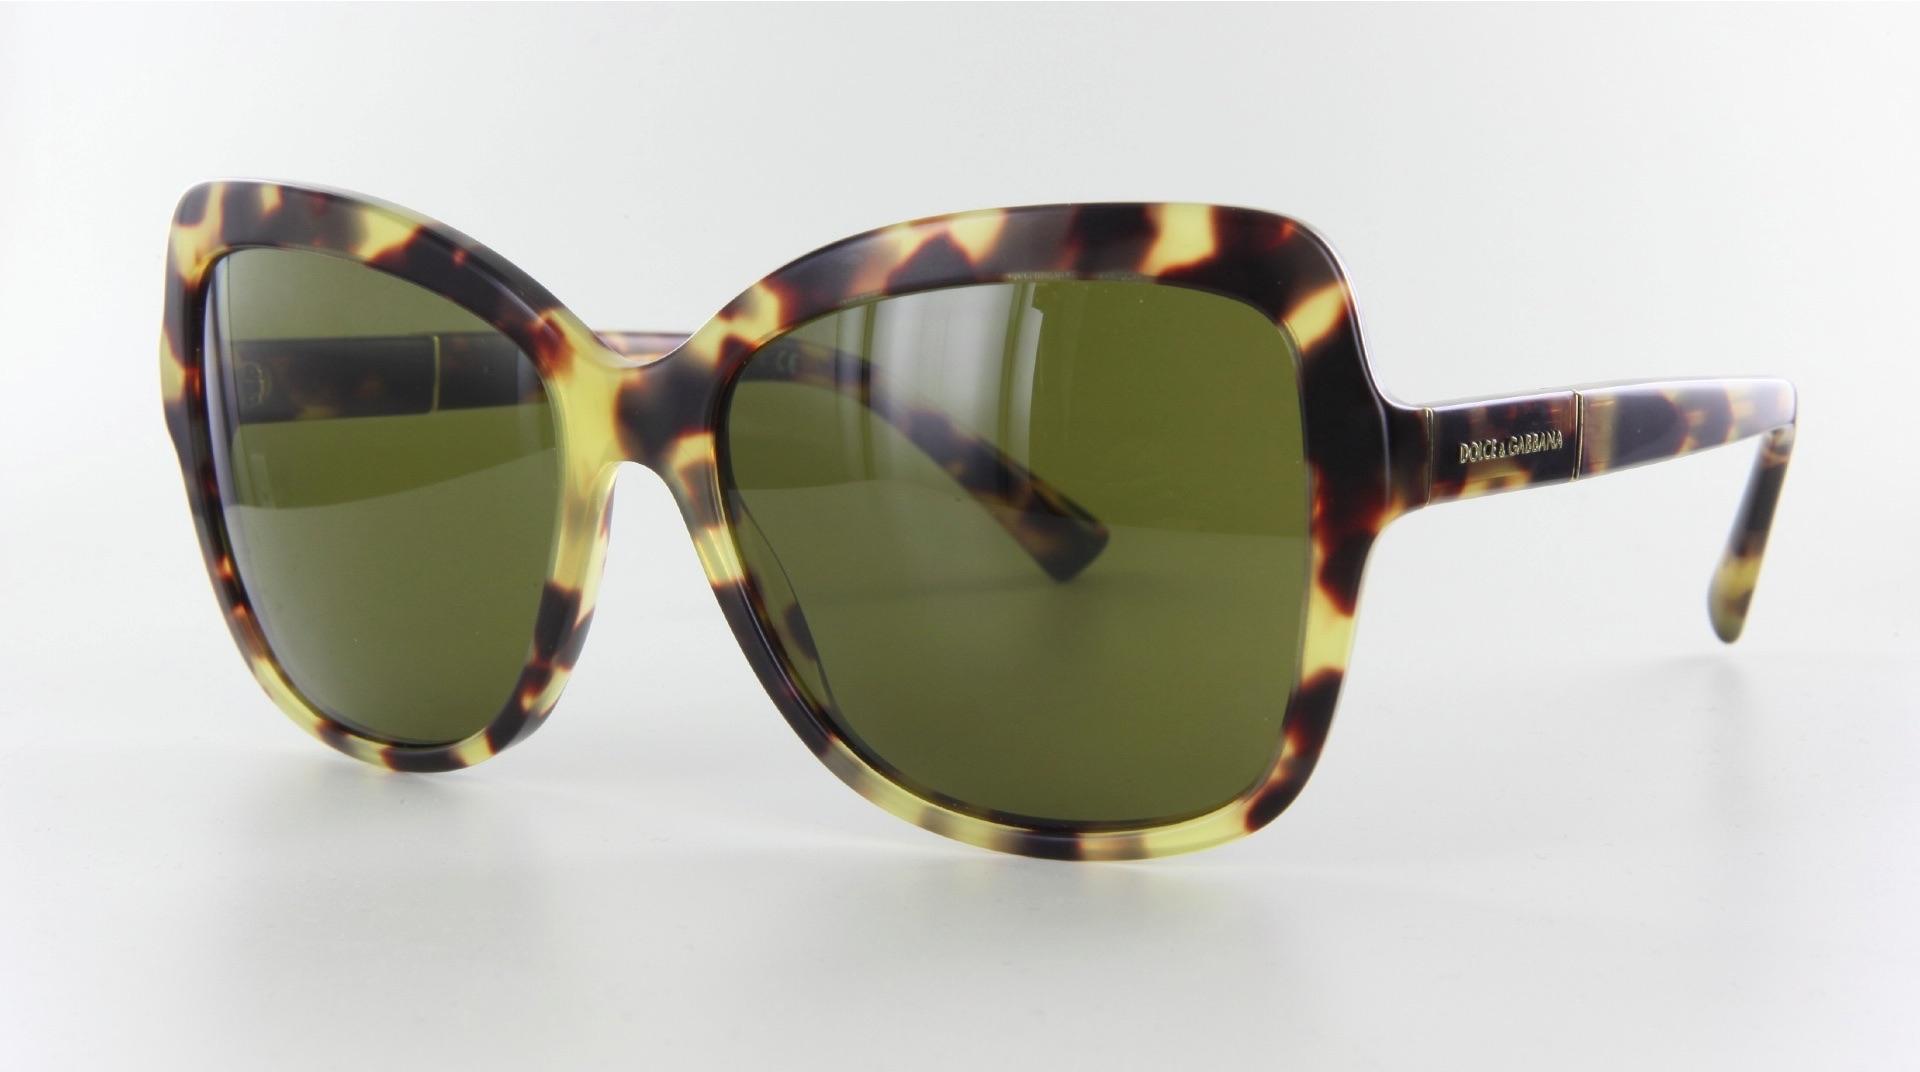 Dolce & Gabbana - ref: 72102